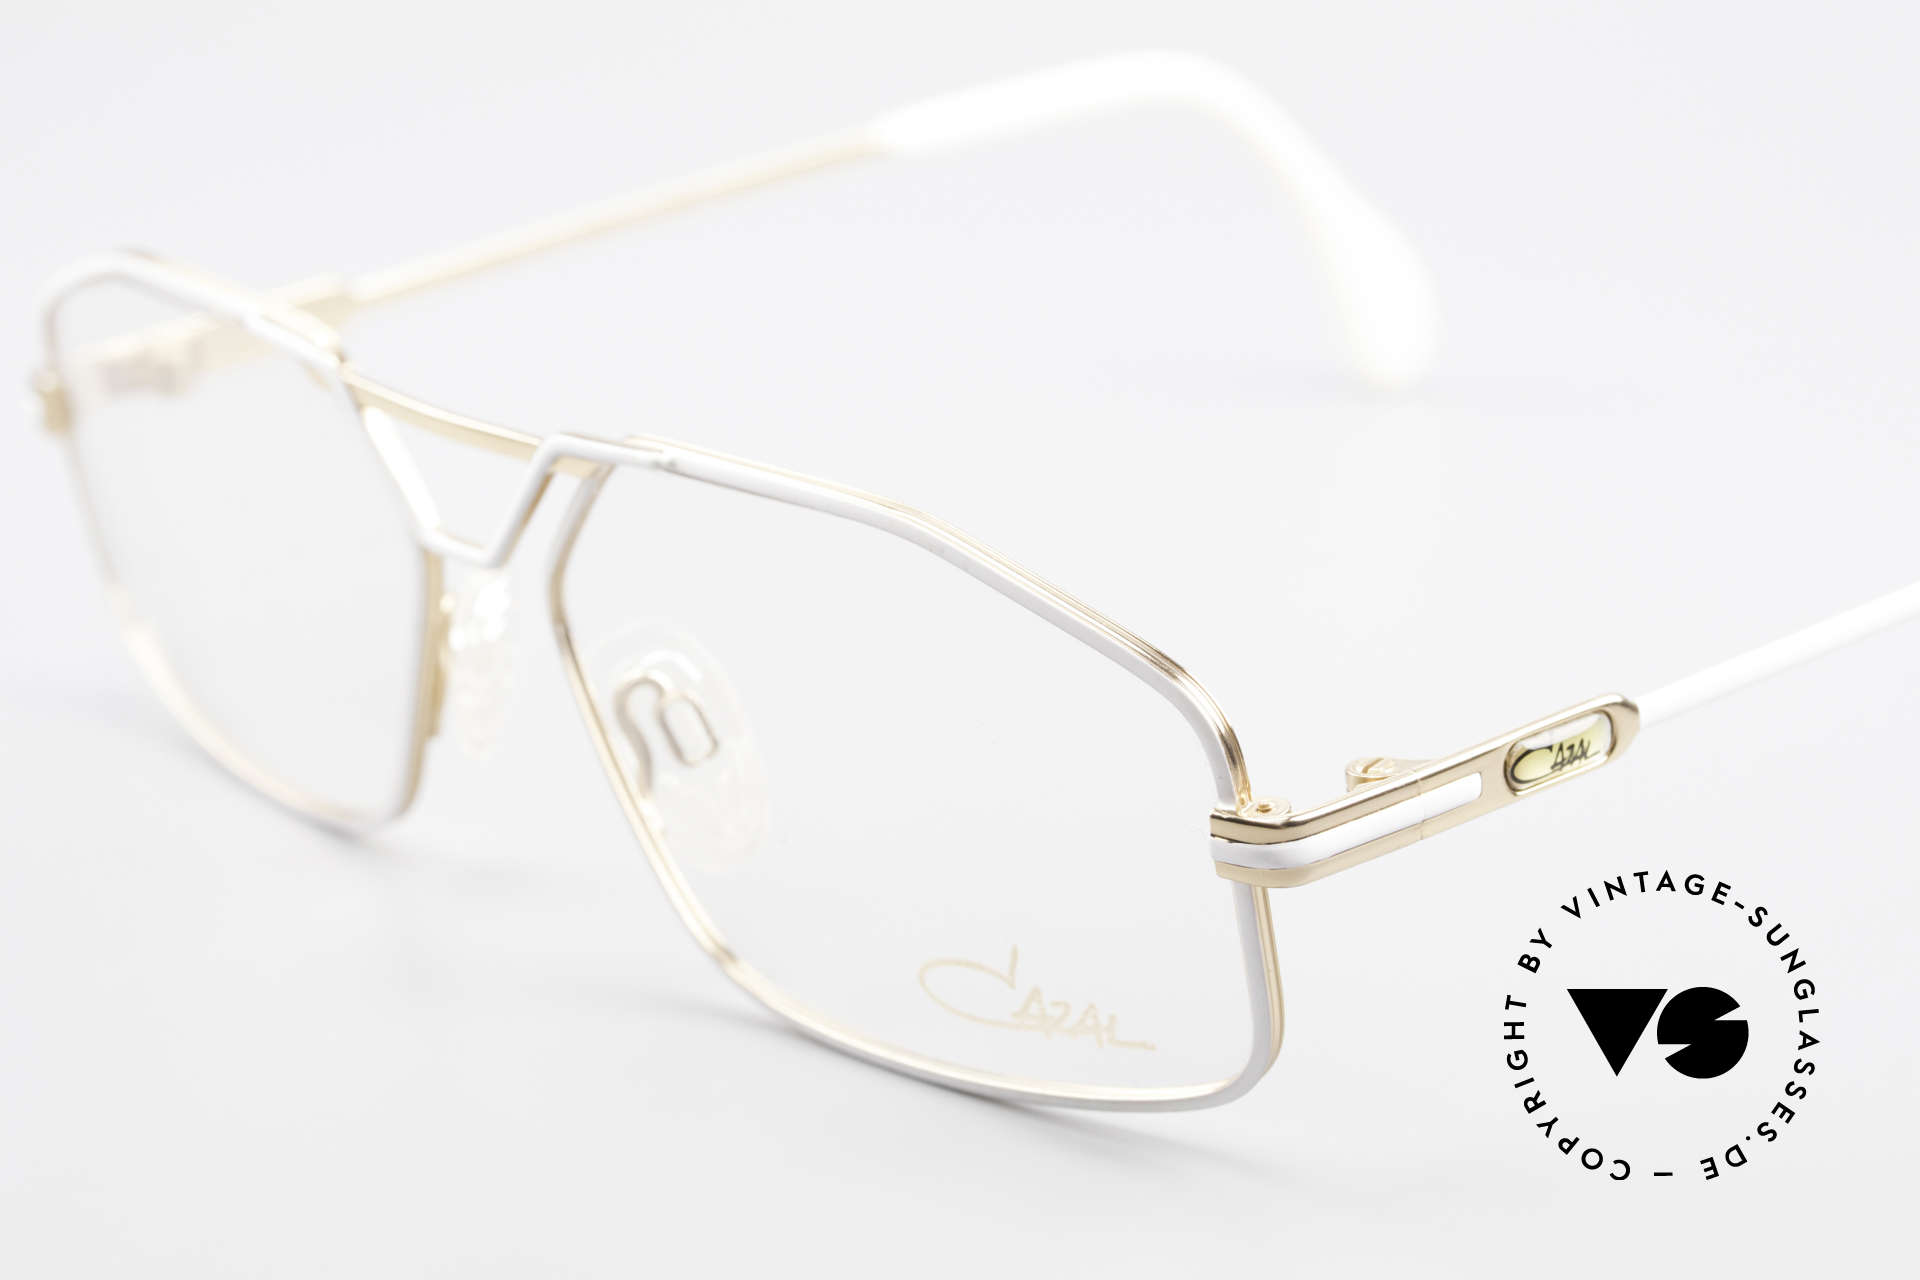 Cazal 729 Vintage Specs NO Retro Frame, never worn, (like all our rare vintage CAZAL frames), Made for Men